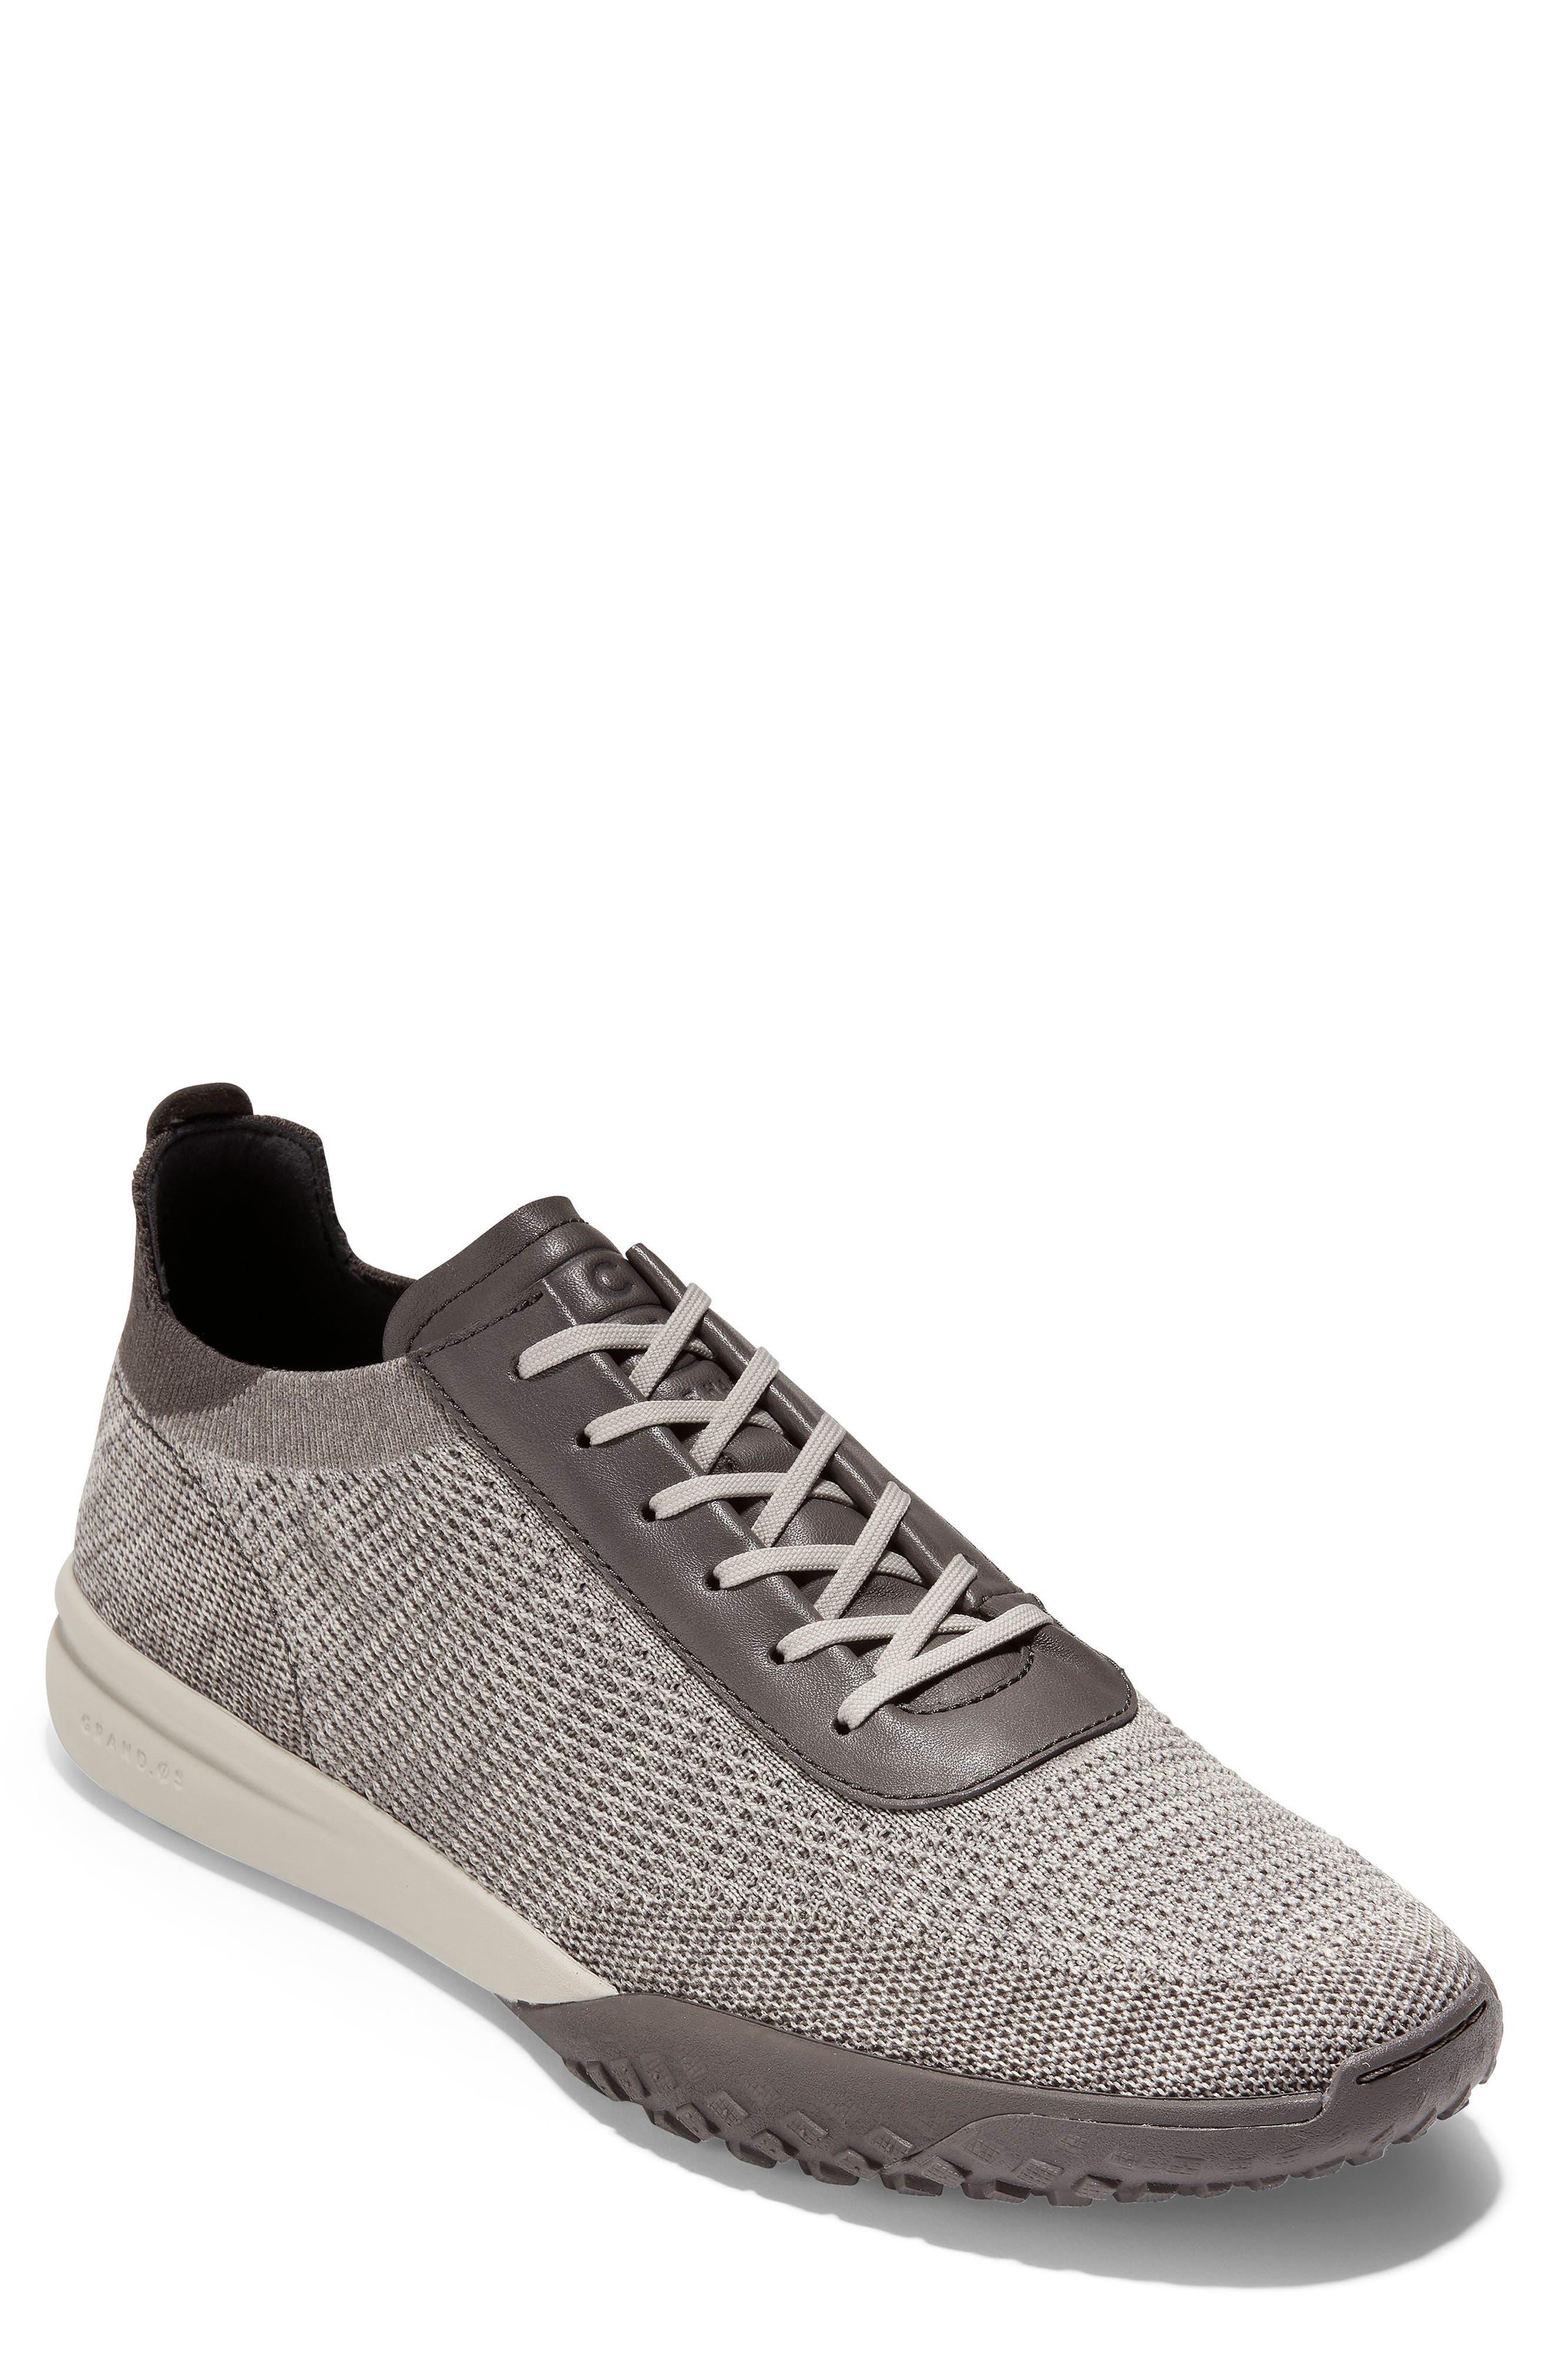 GrandPro Trail Low Stitchlite Sneaker, Main, color, BLACK/ VAPOR GREY KNIT